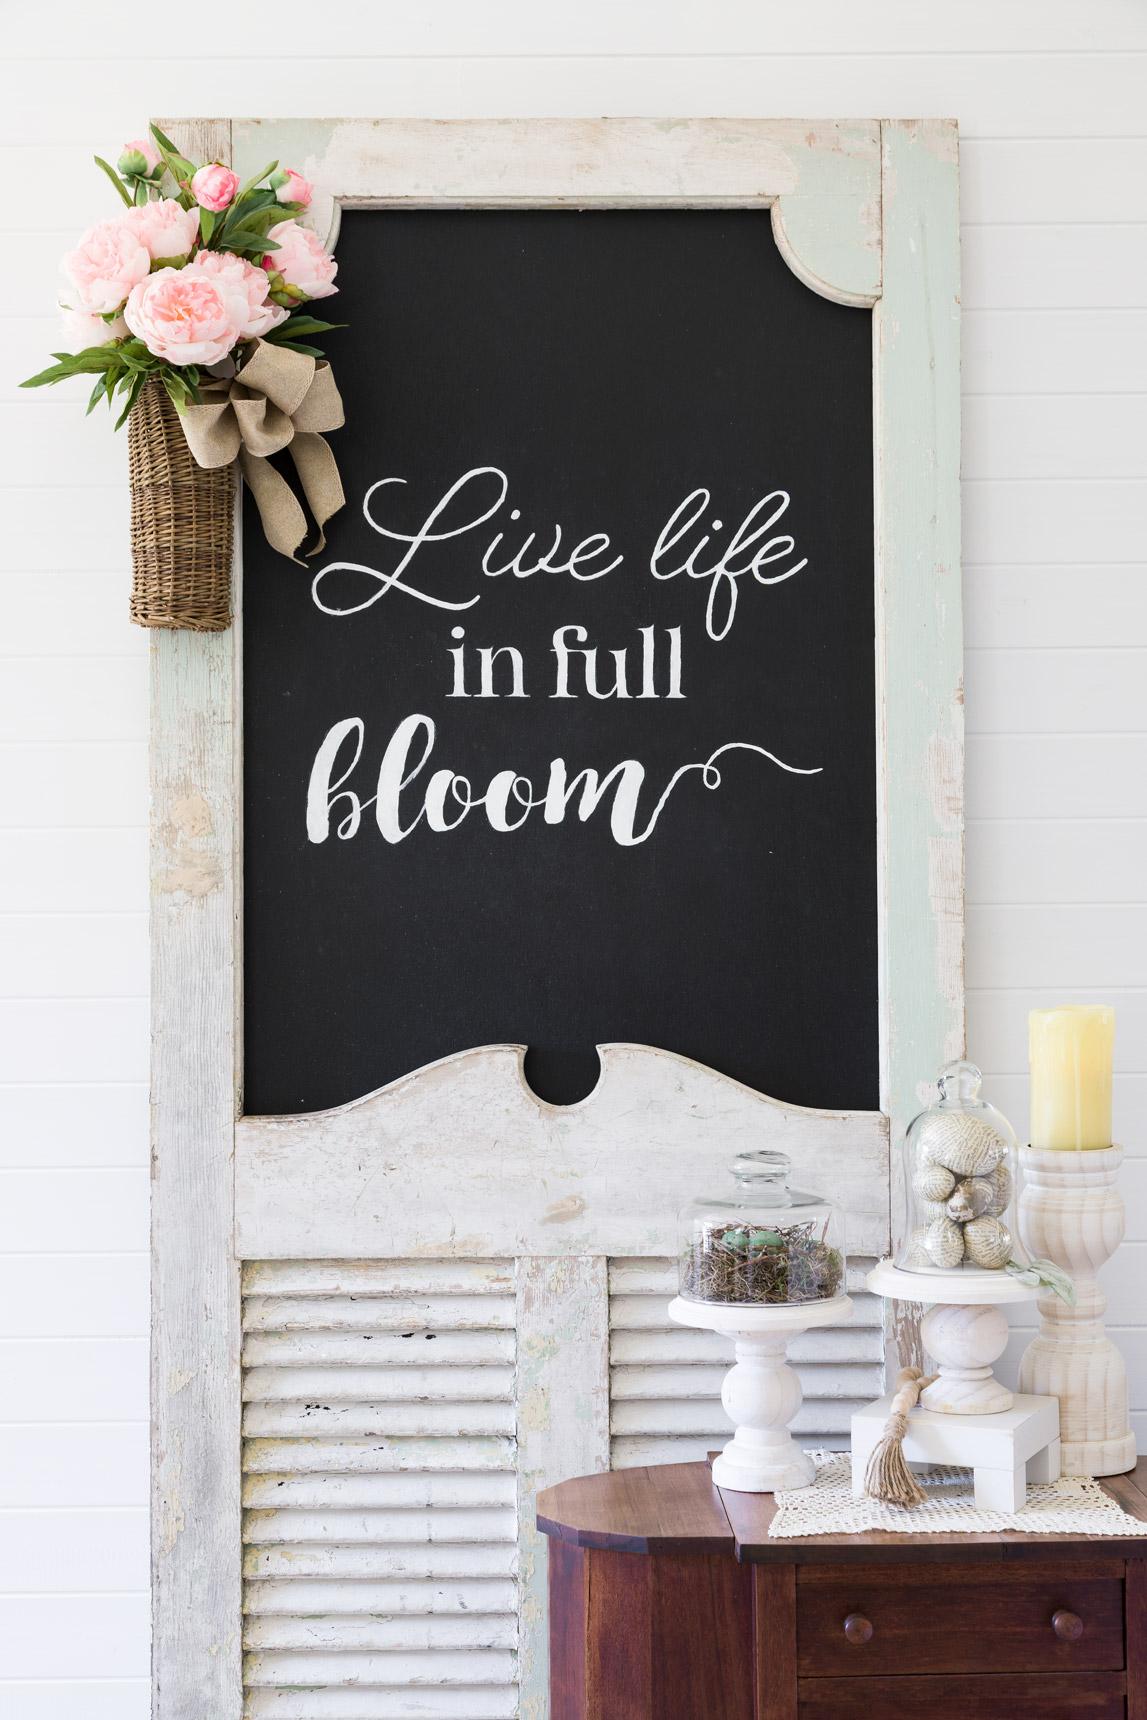 DIY Live Life in Full Bloom Farmhouse Chalkboard Sign